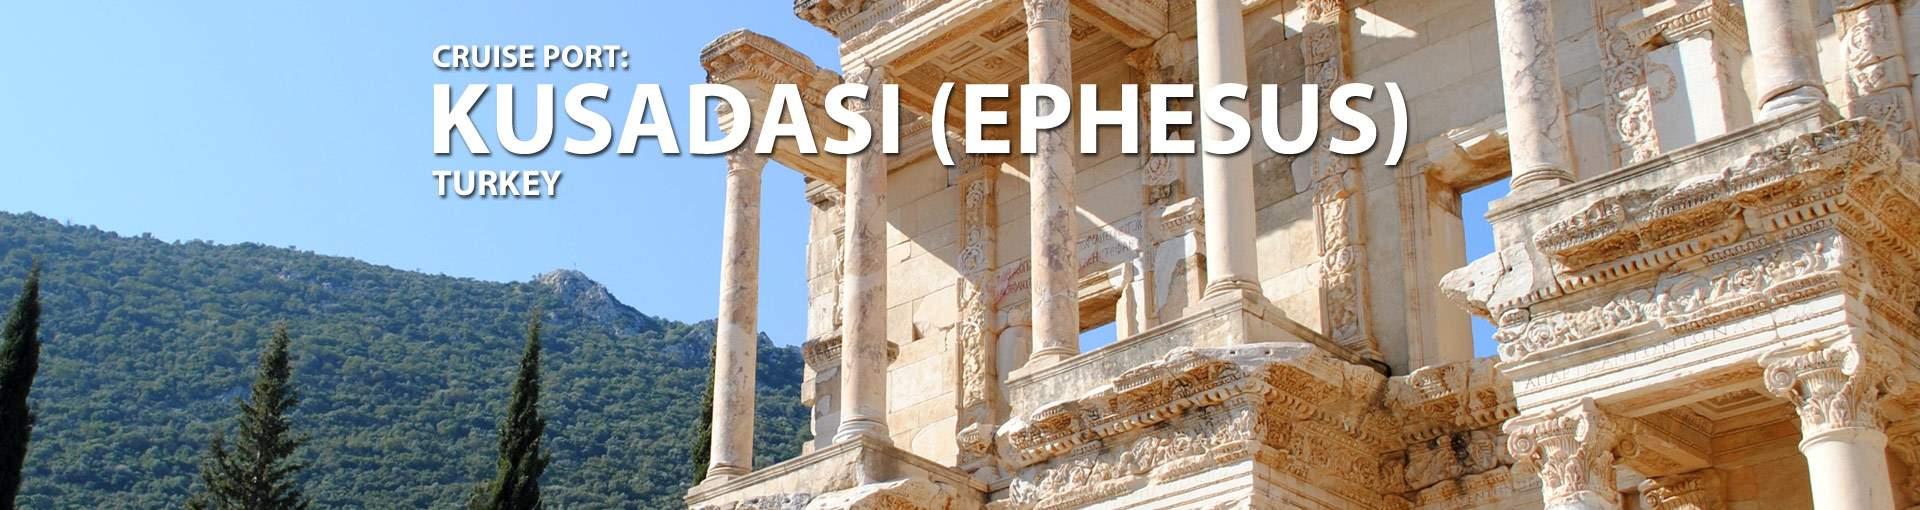 Cruises to Kusadasi (Ephesus), Turkey